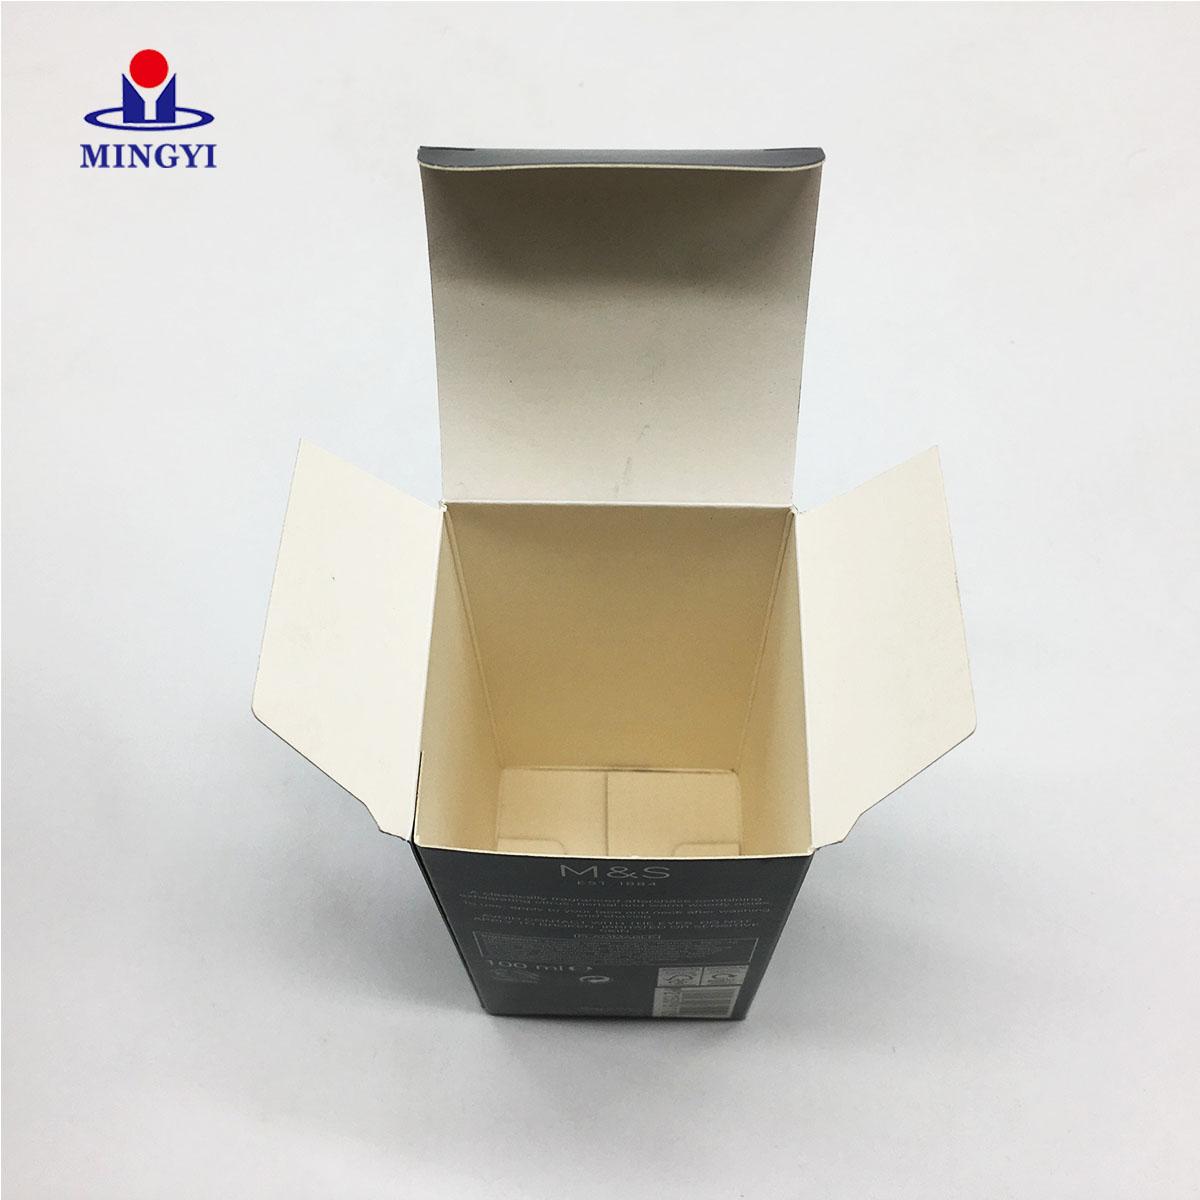 Mingyi Printing Array image43